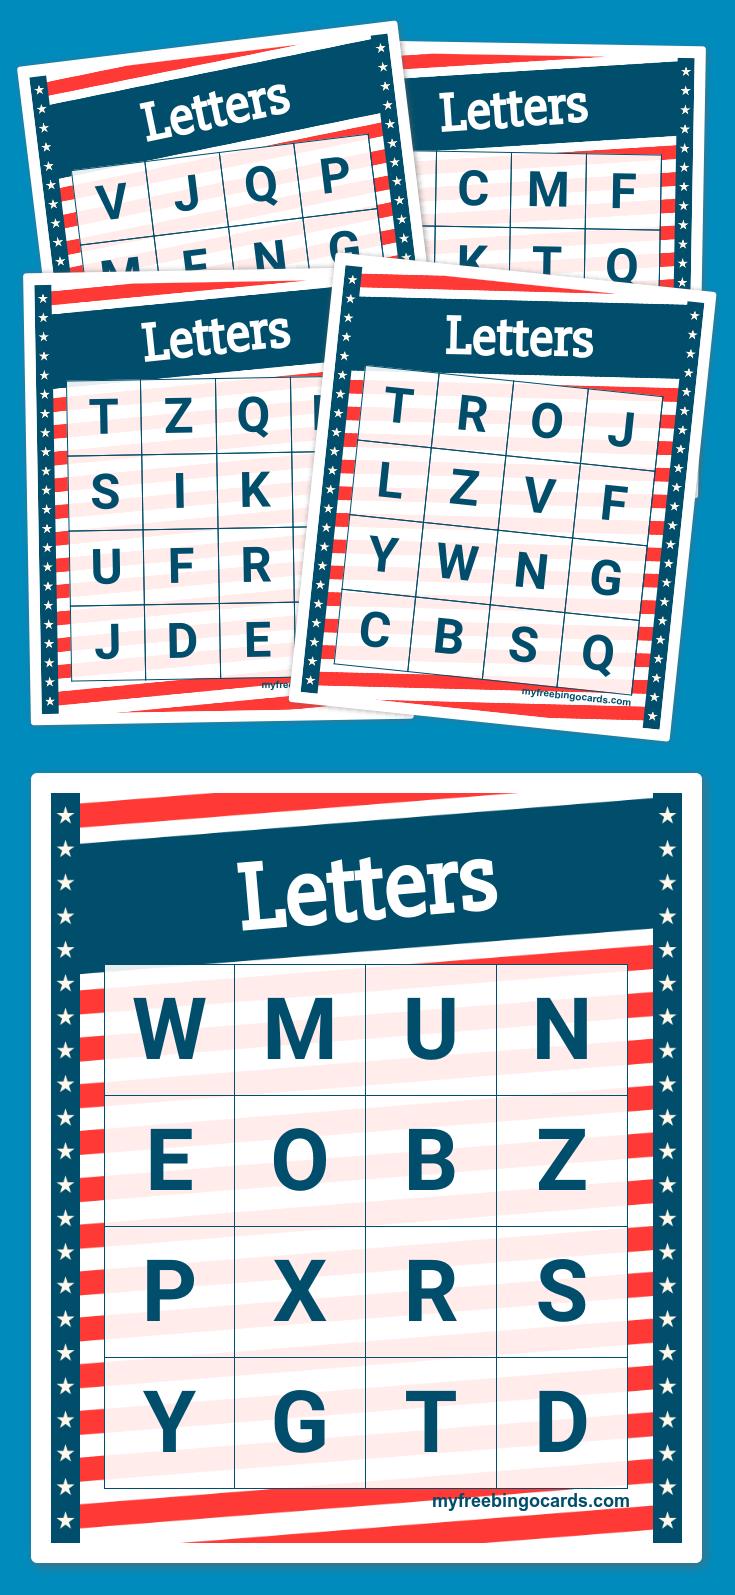 Letters Bingo | Education | Pinterest | Free printable bingo cards ...